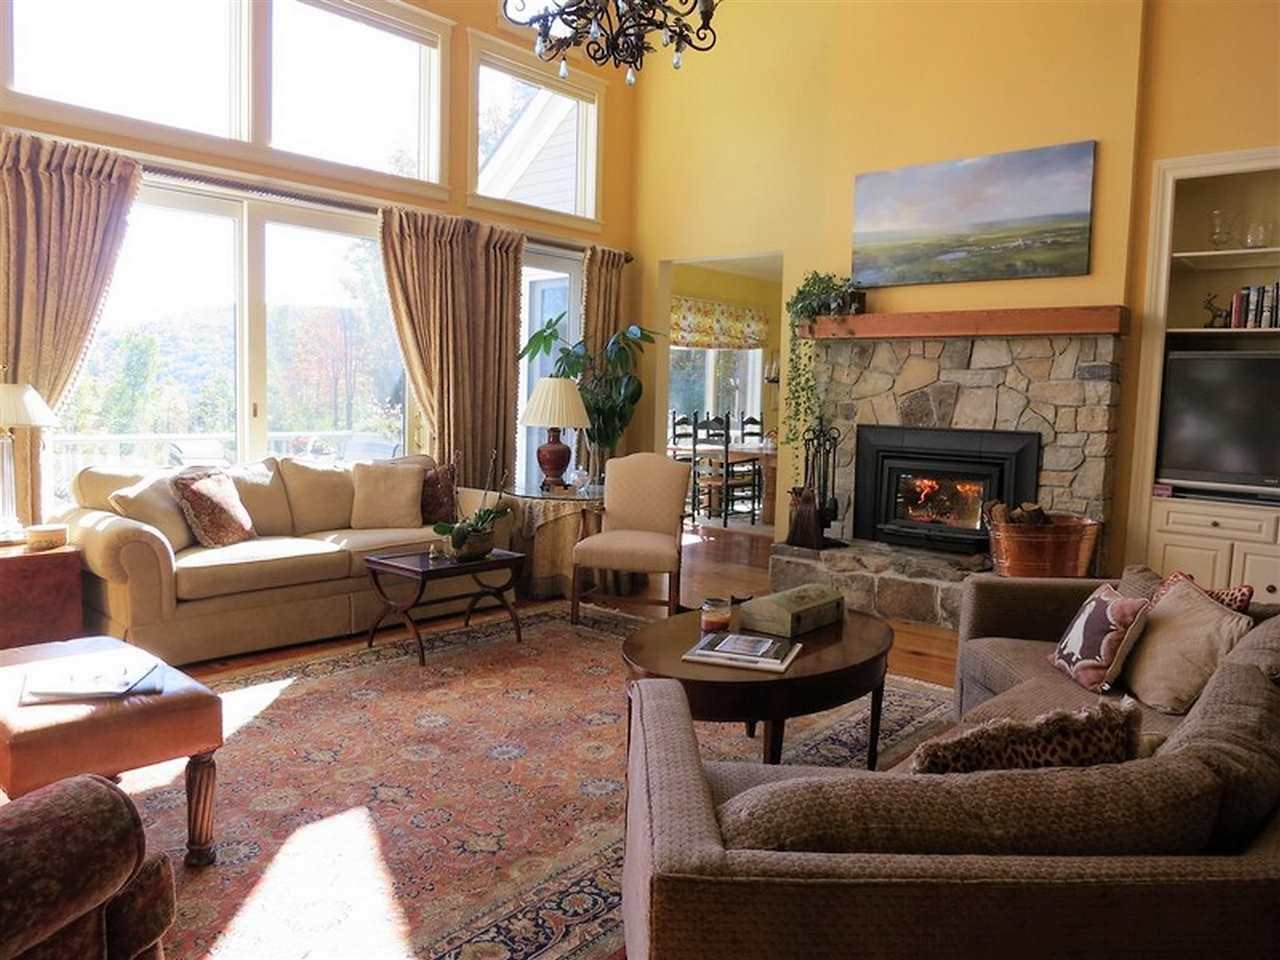 Mount-Snow-Real-Estate-4618541-8